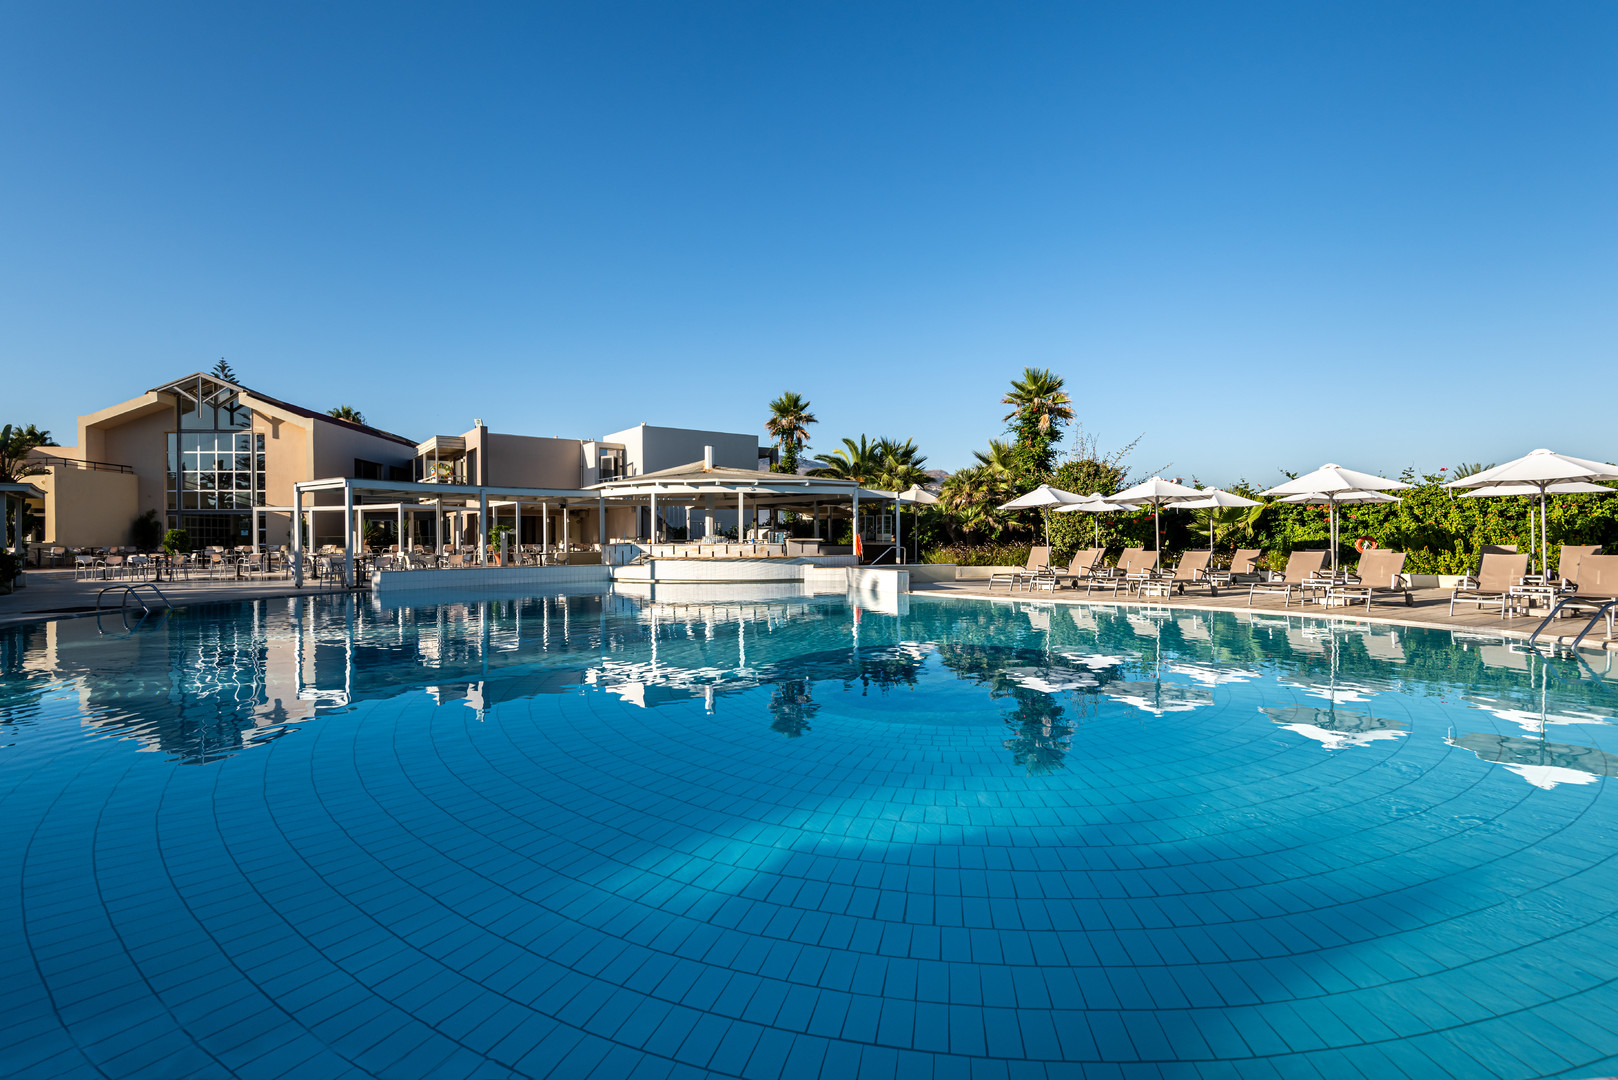 Hotel Minos Mare #2